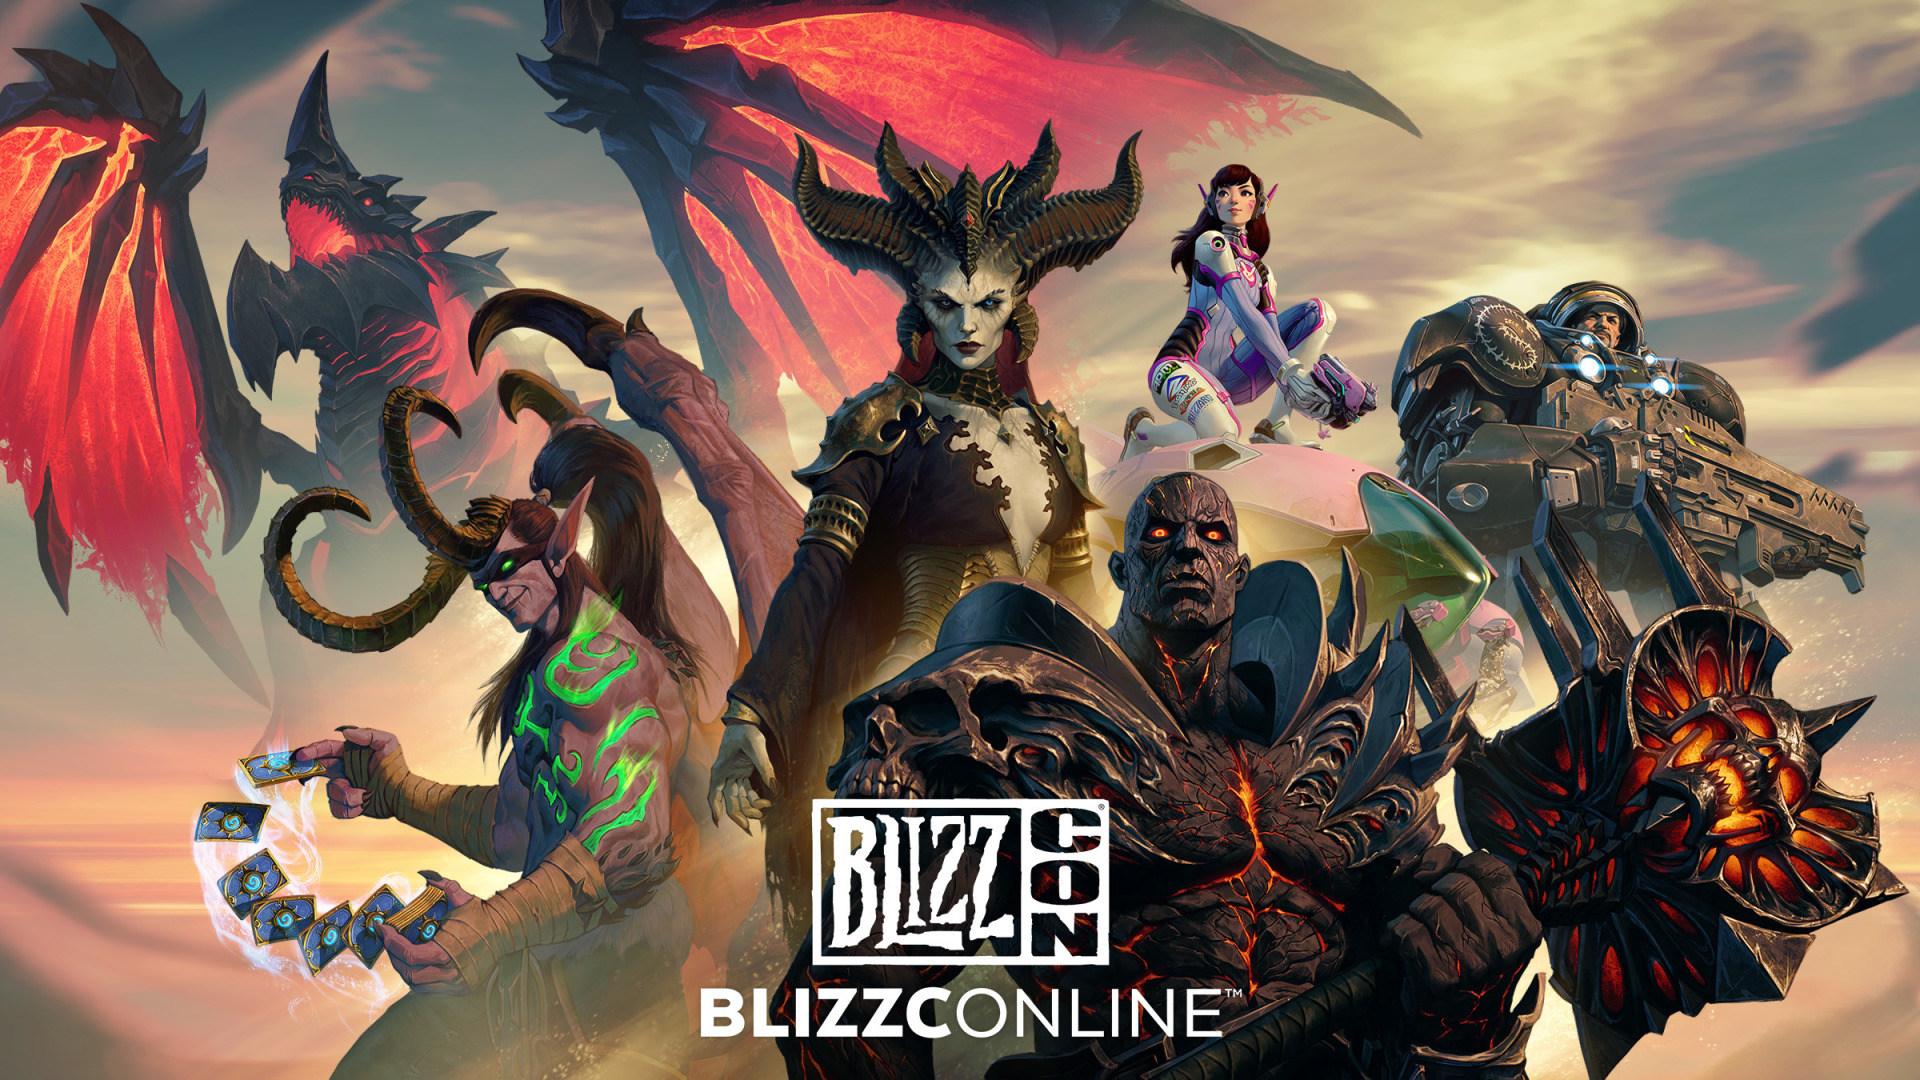 Logo, Blizzard Entertainment, Blizzcon 2021, BlizzConline